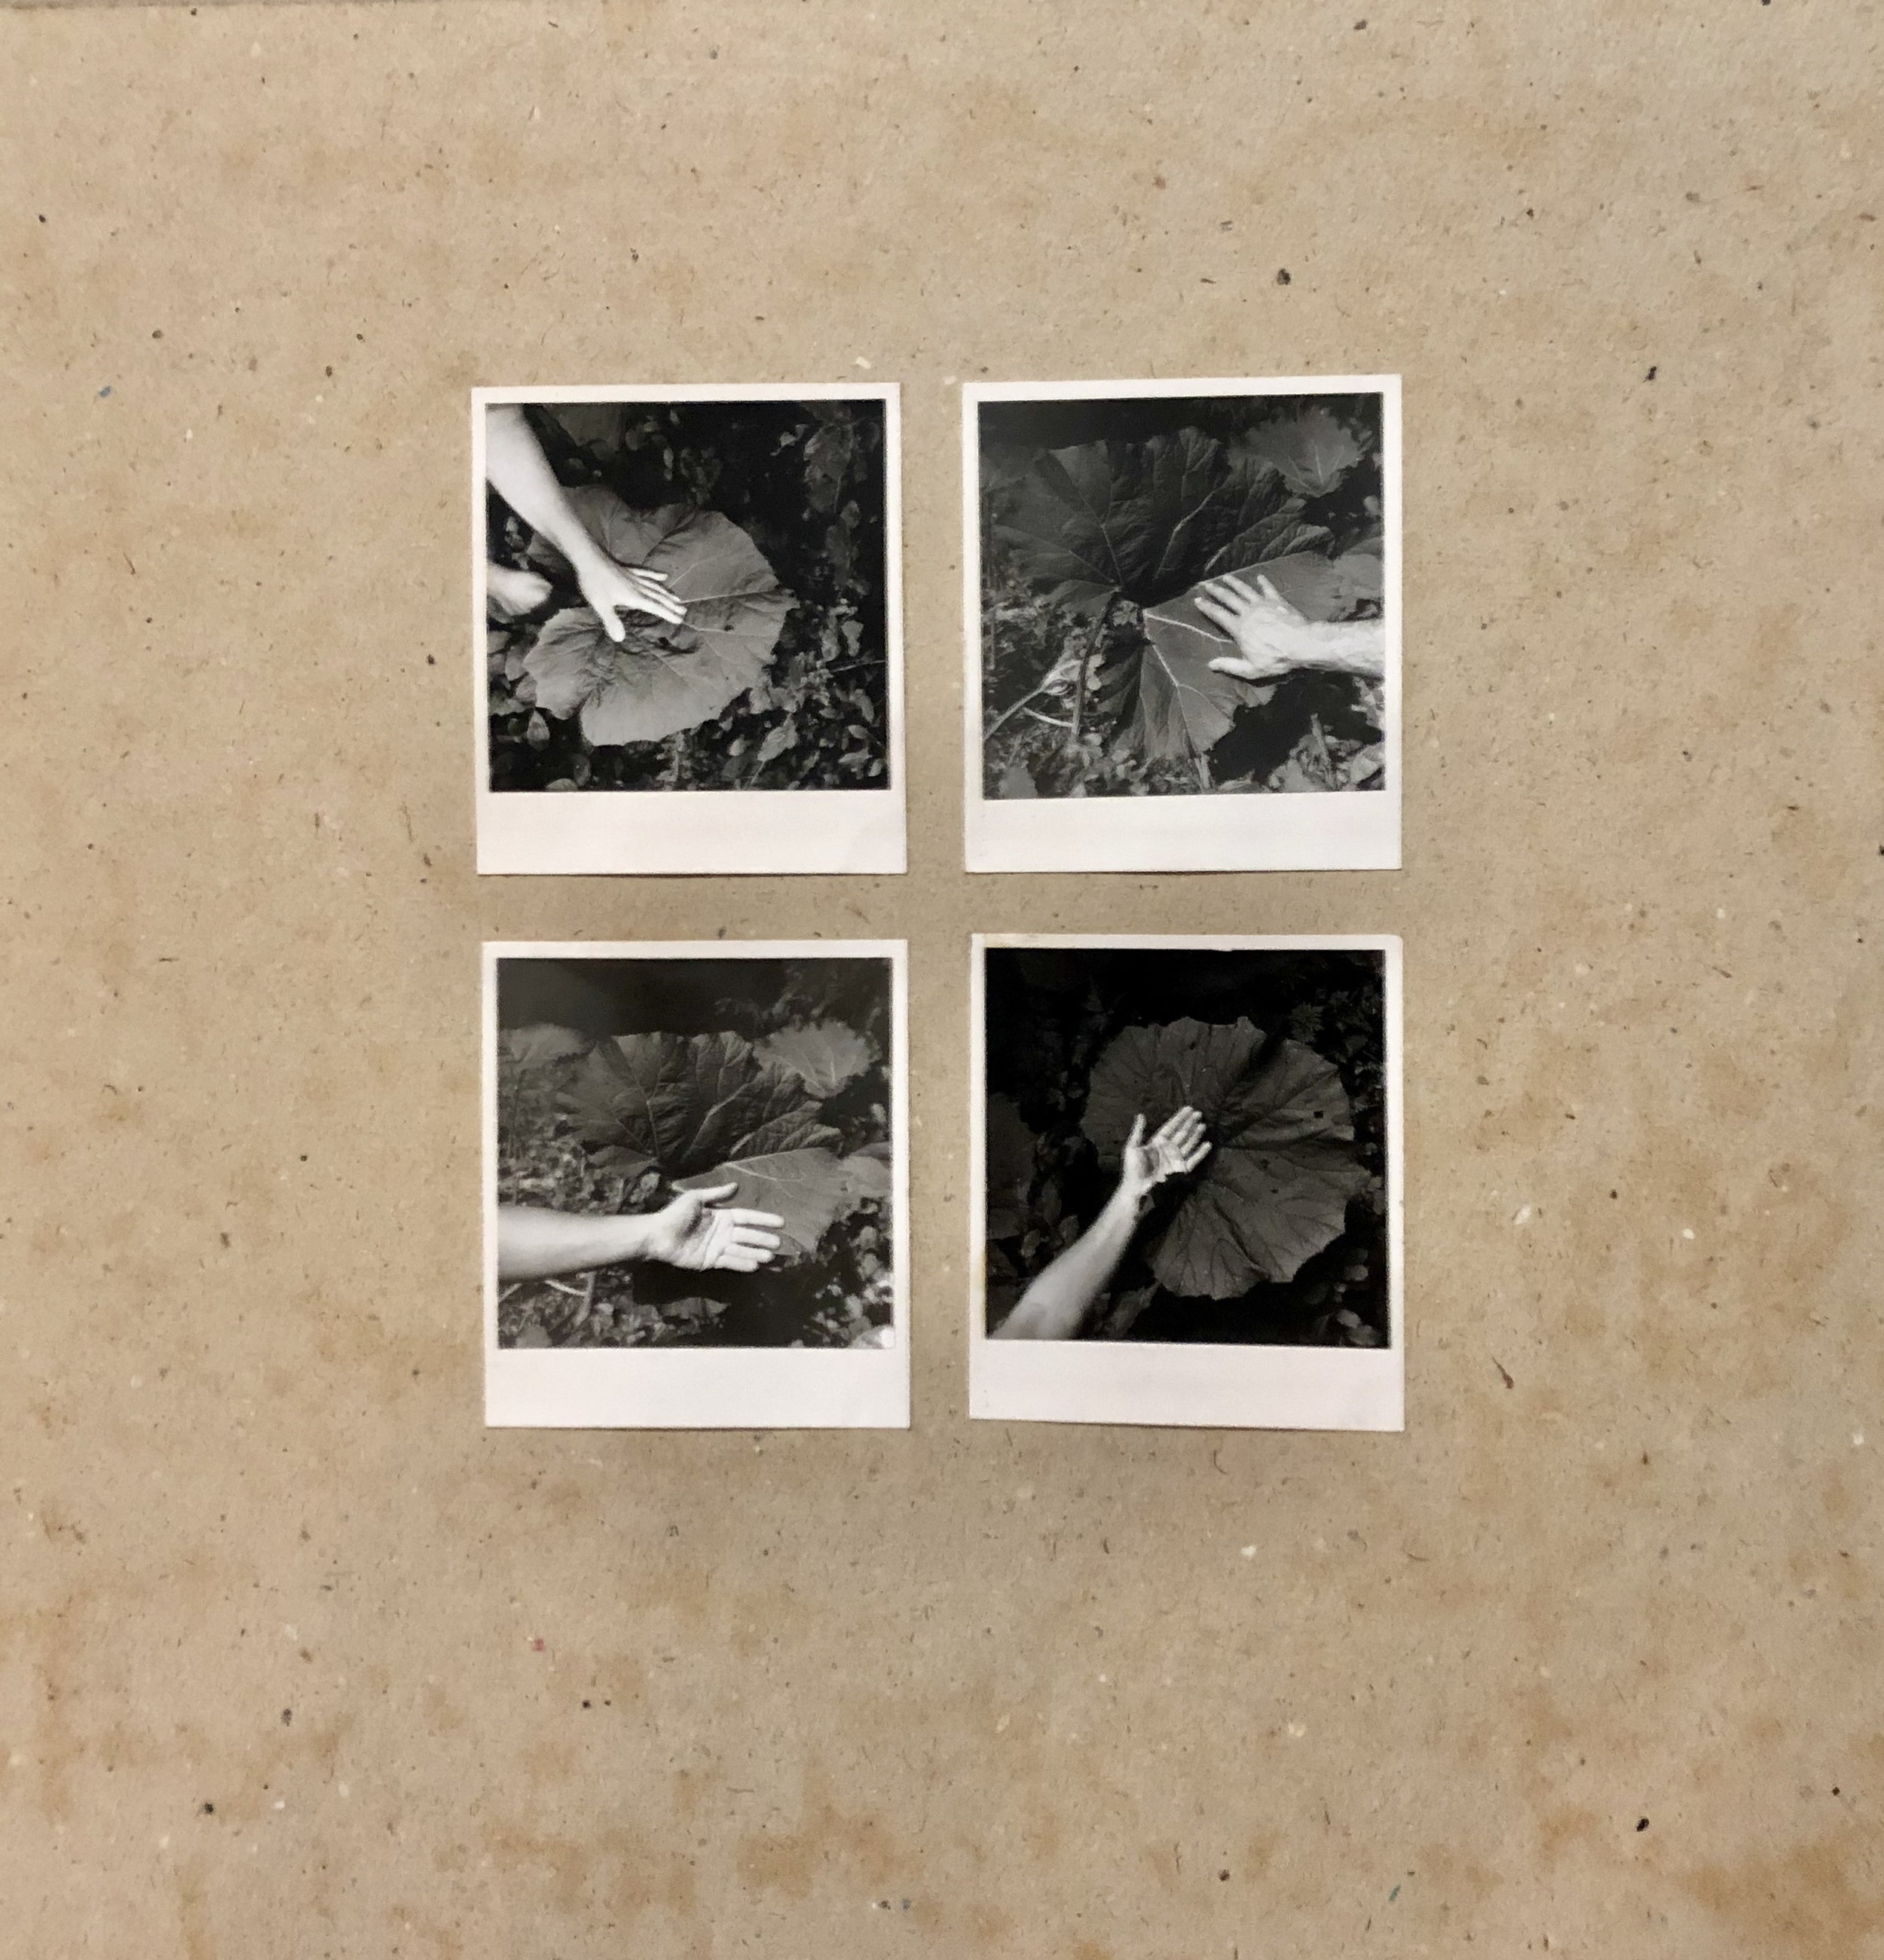 Kern Michal, 1979, Lopúchy, 4 fotografie na kartóne, 4x10x9 cm